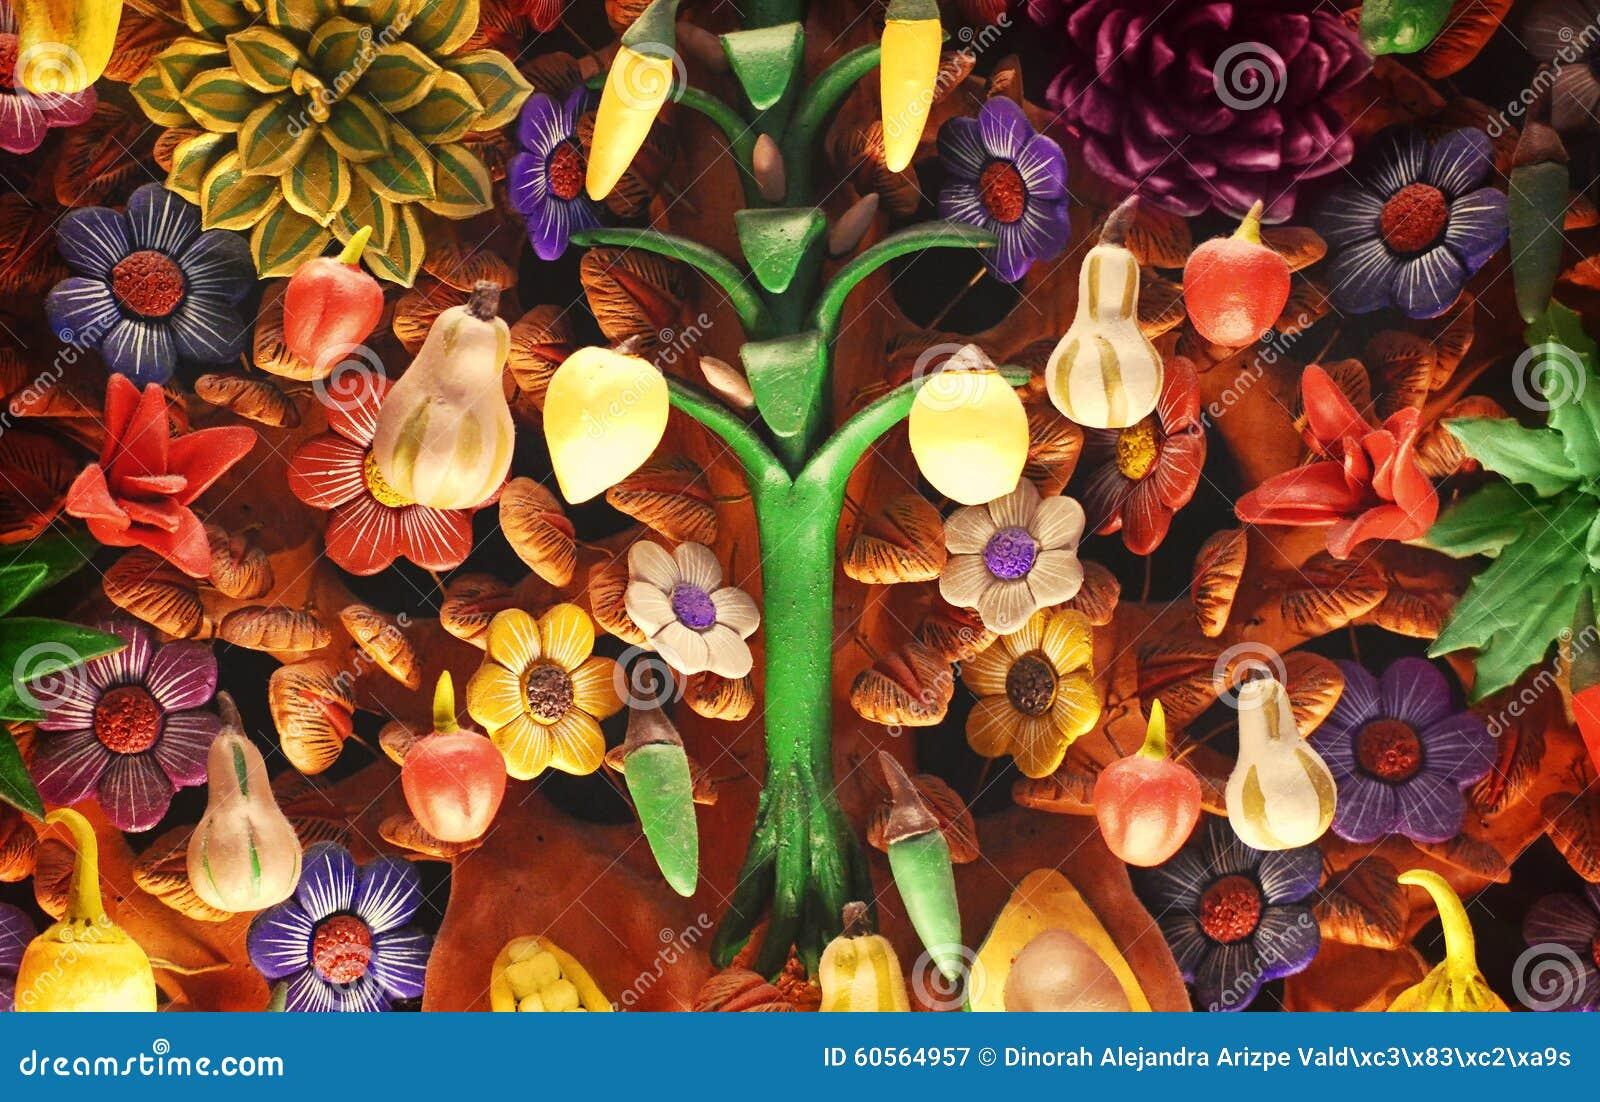 Mexikanischer Baum des Lebens